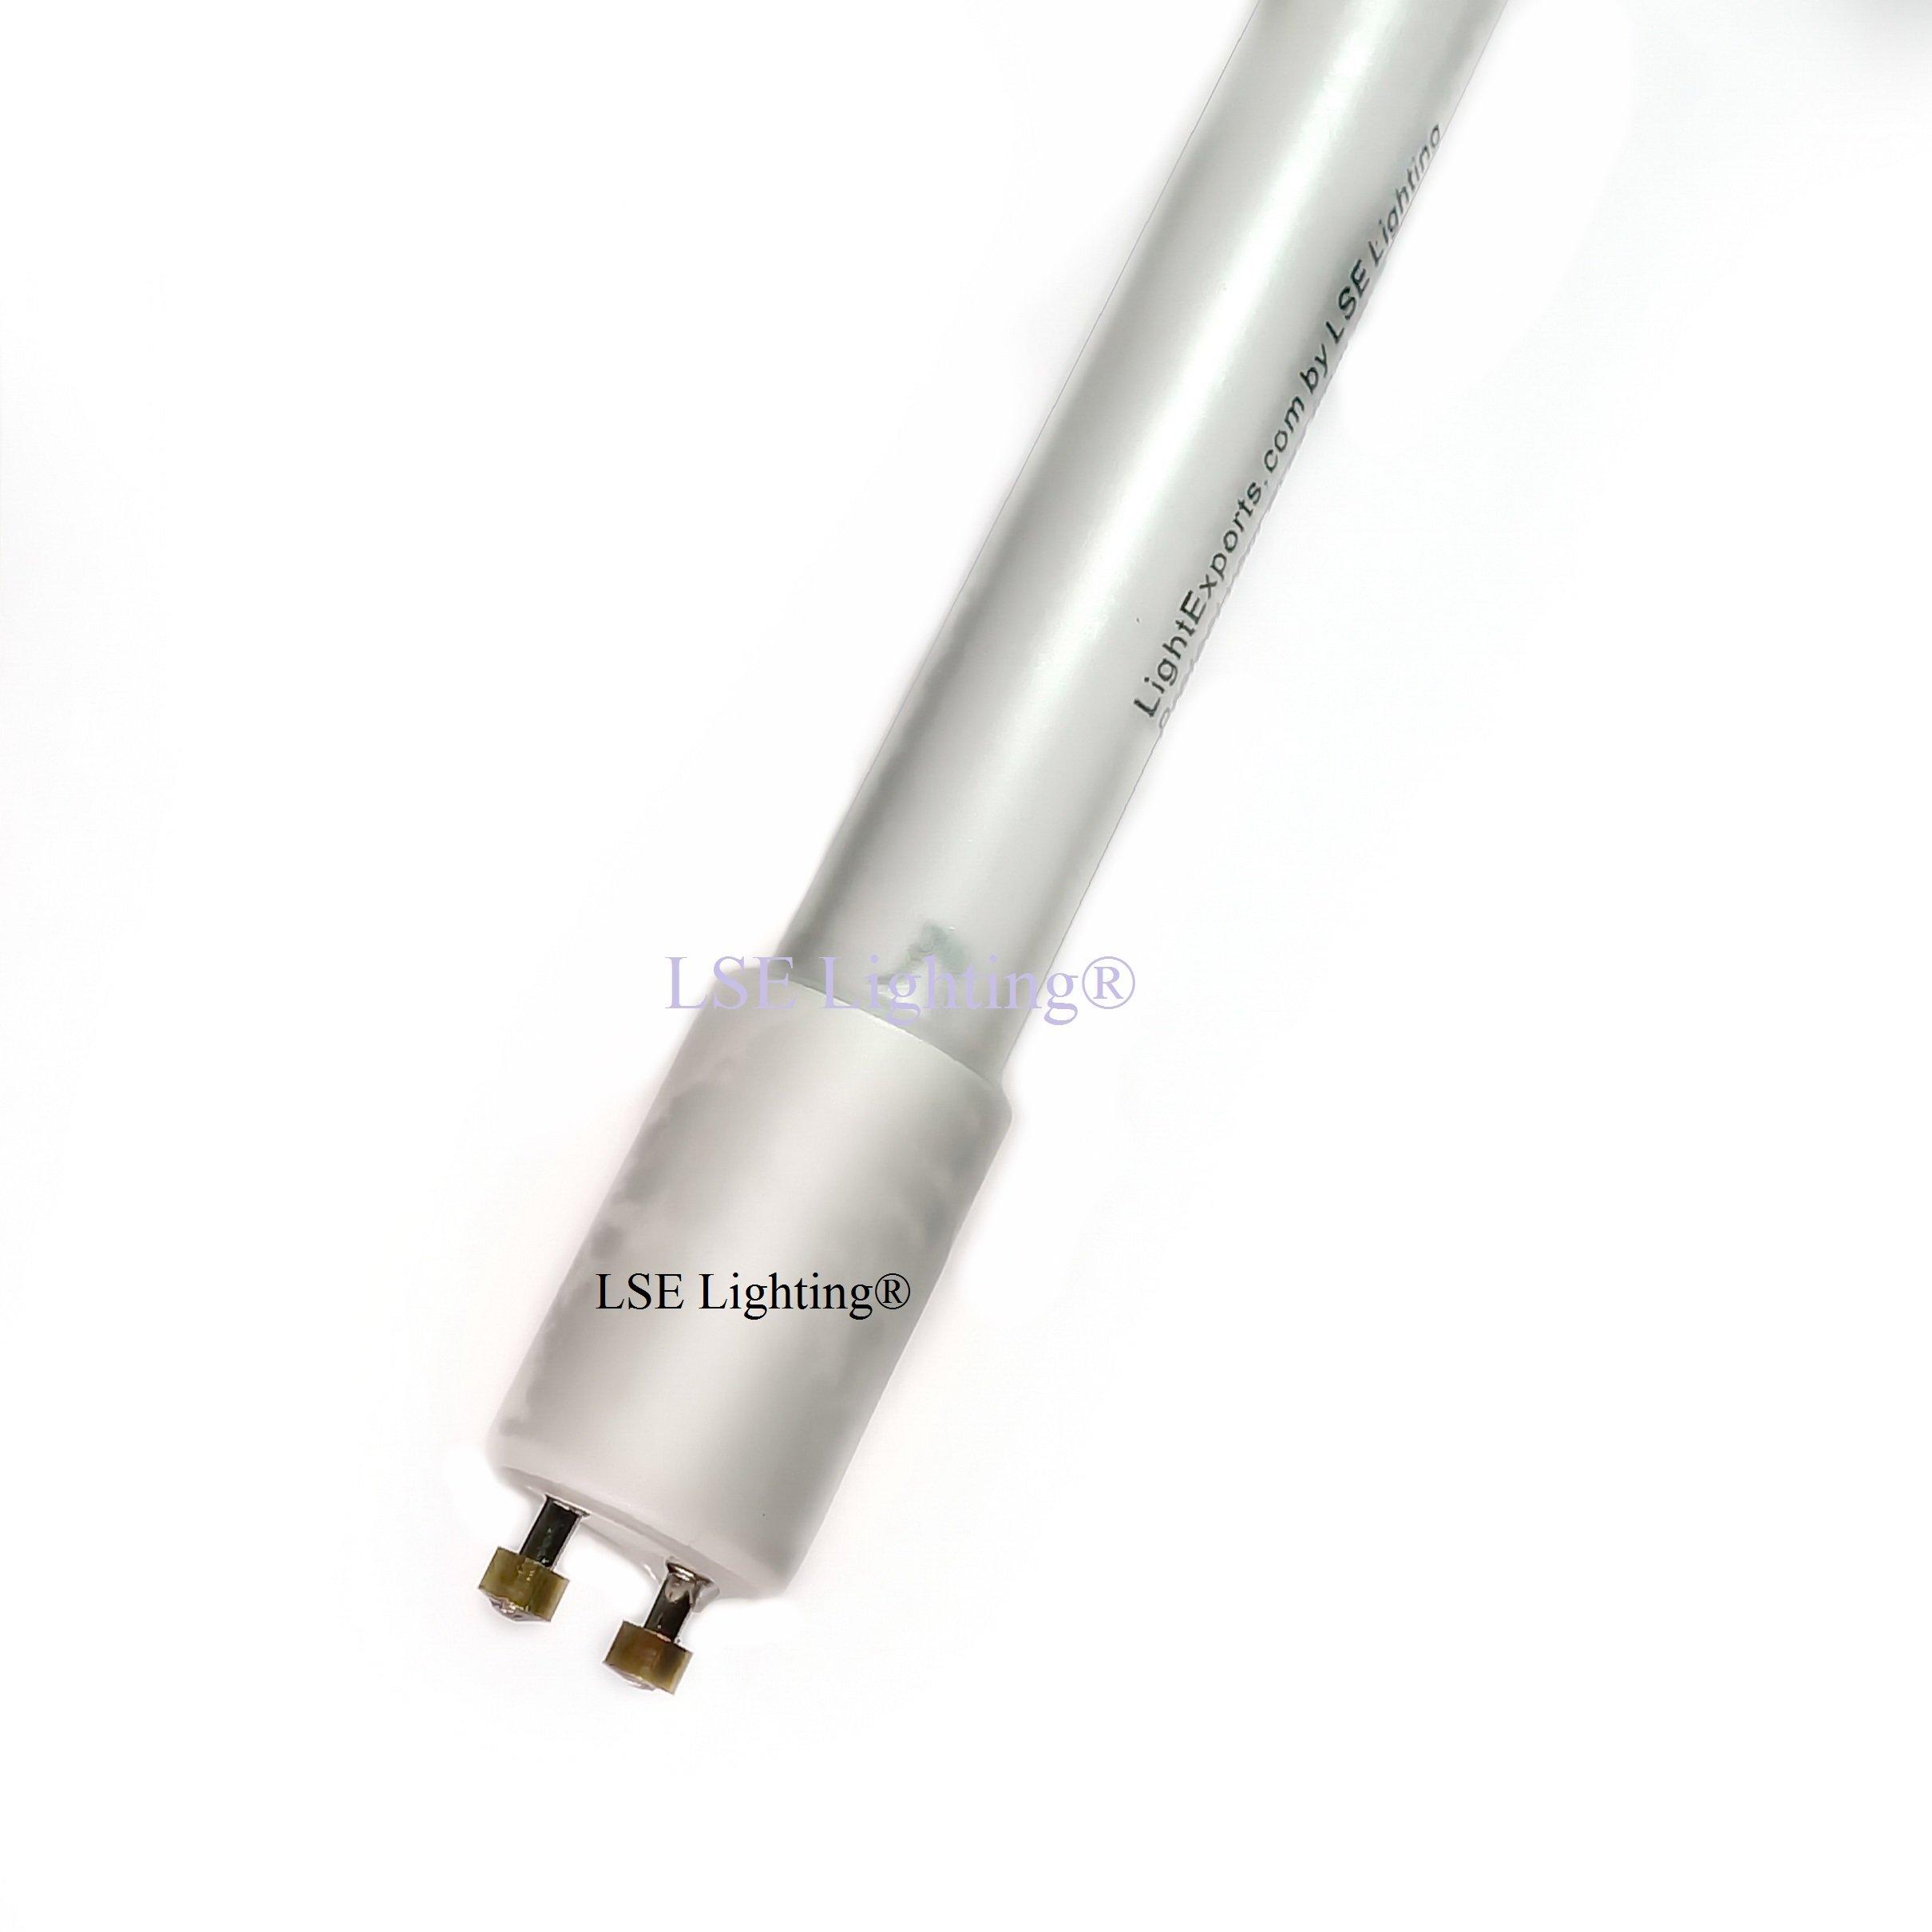 LSE Lighting 26W UV Replacement Lamp for Savio Uvinex